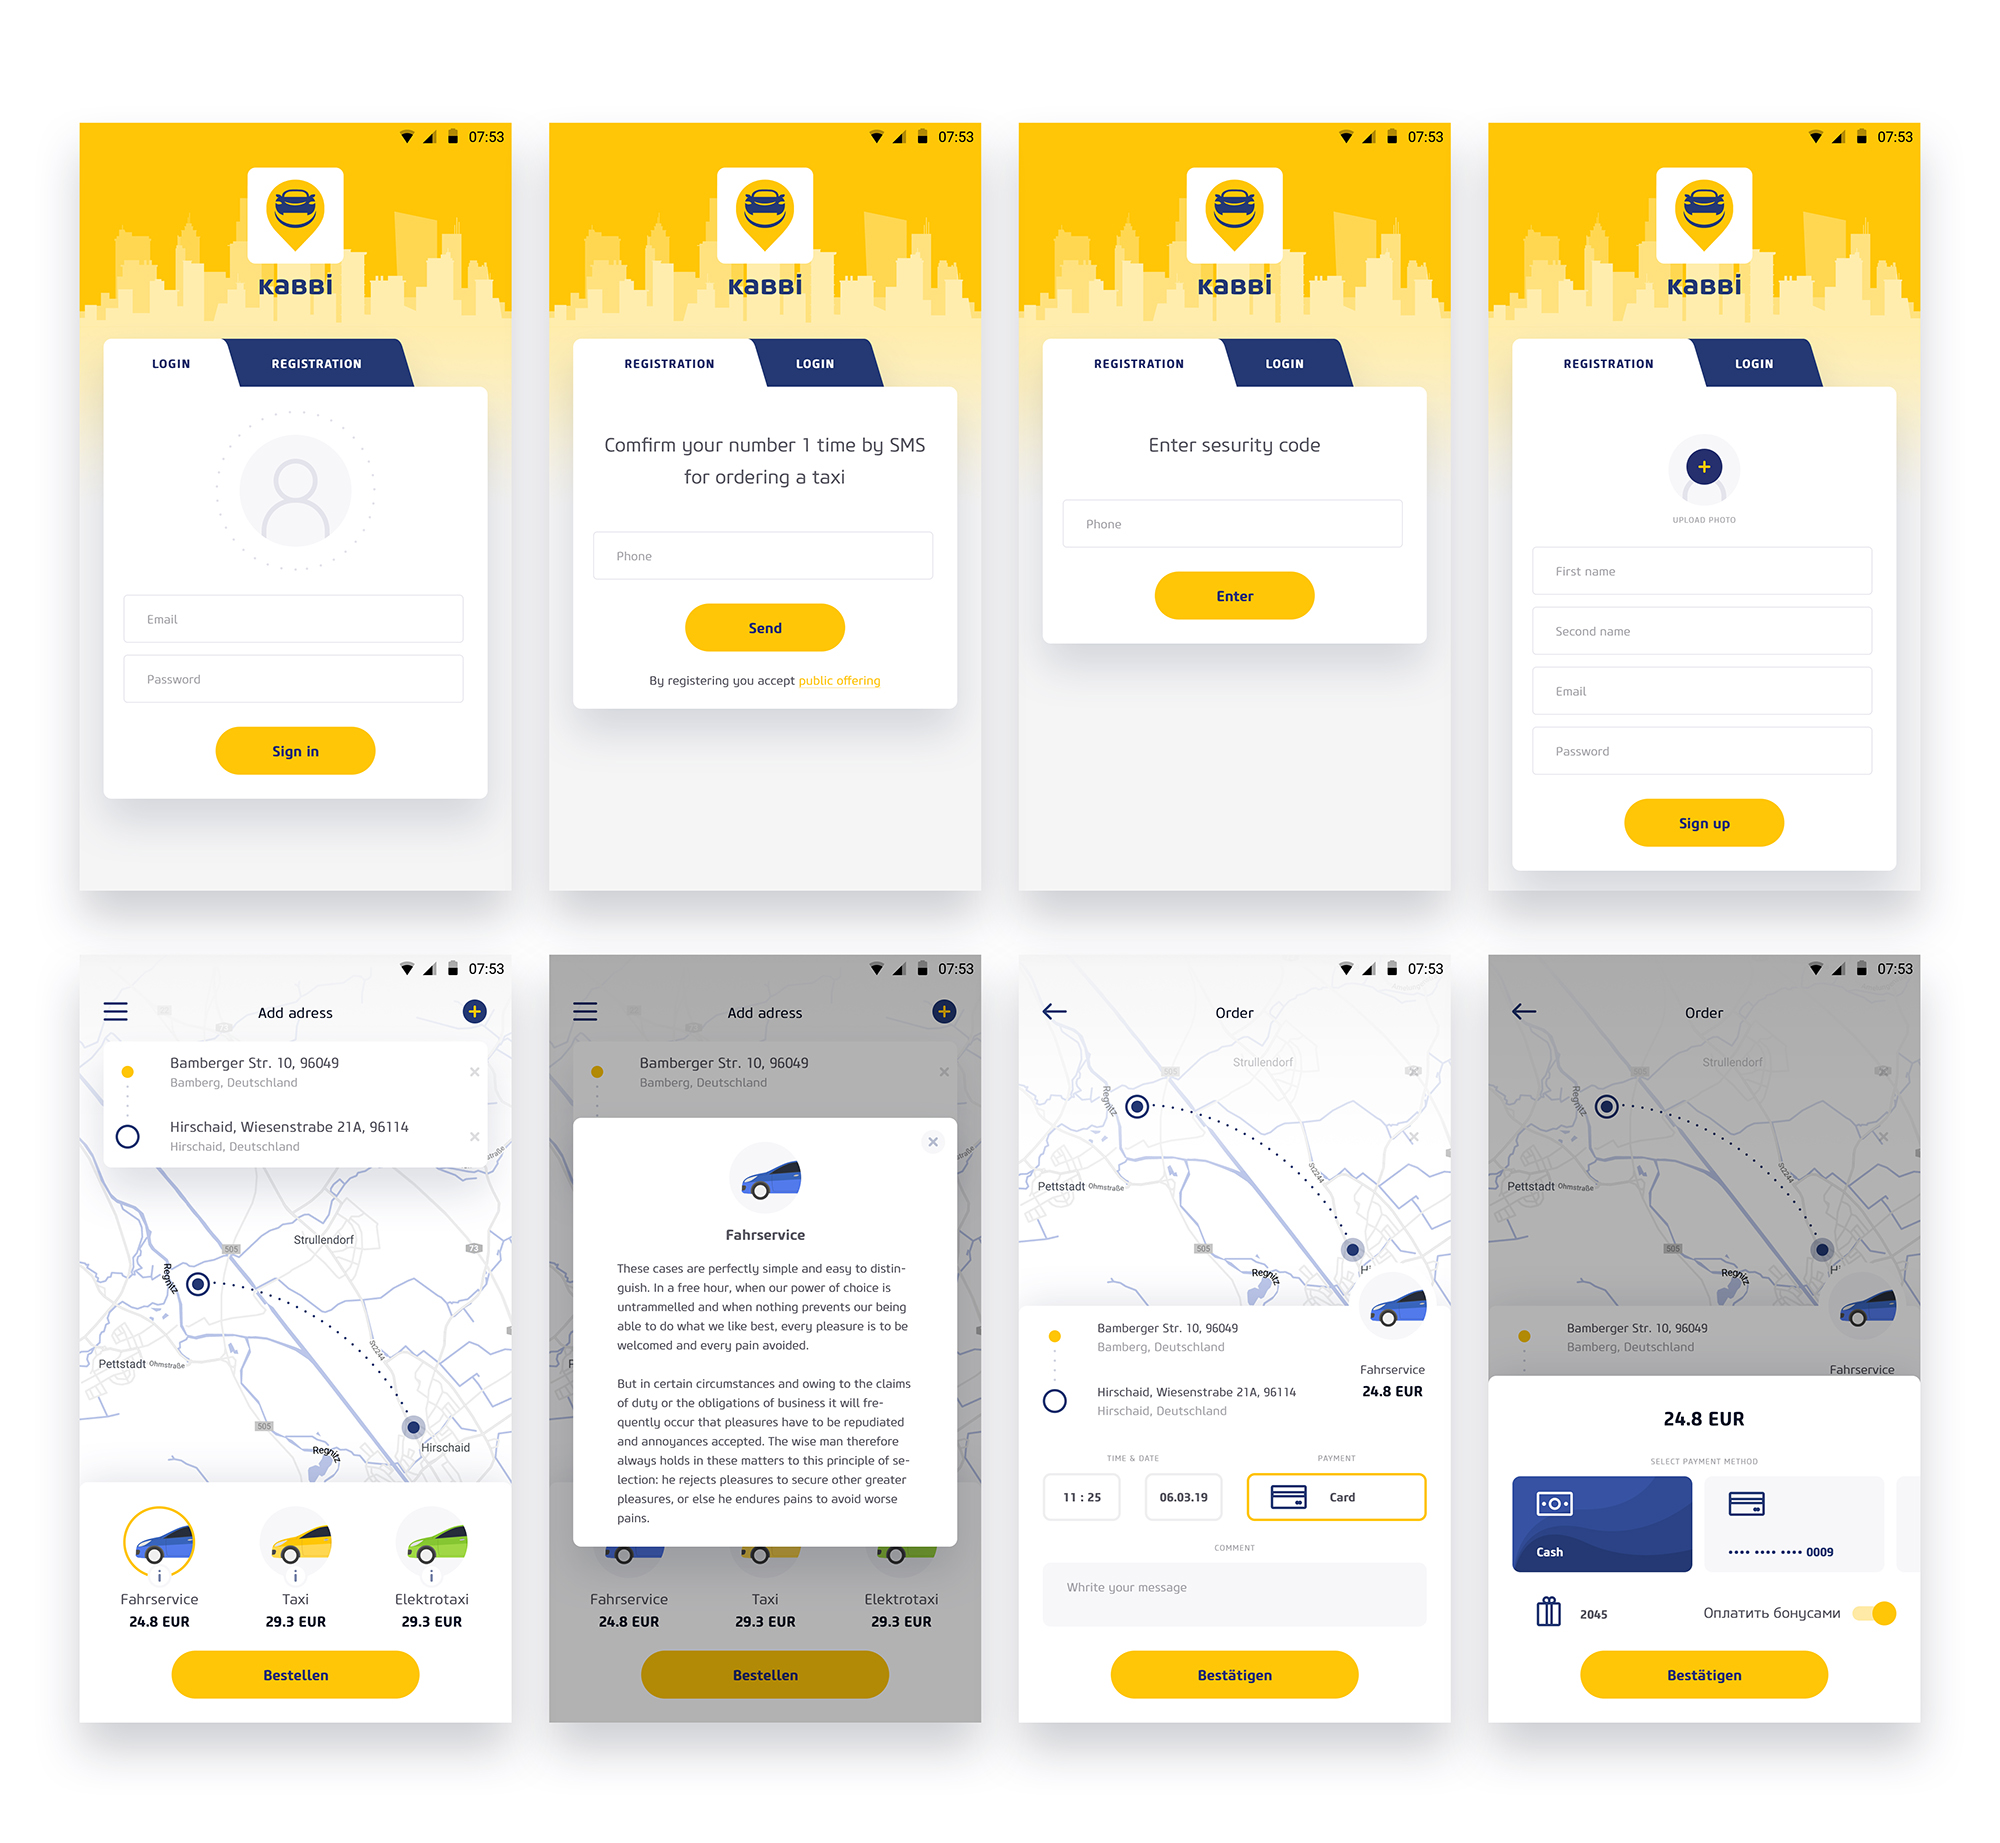 IOS   https://apps.apple.com/de/app/id1311333542    Android  https://play.google.com/store/apps/details?id=com.kabbi.c